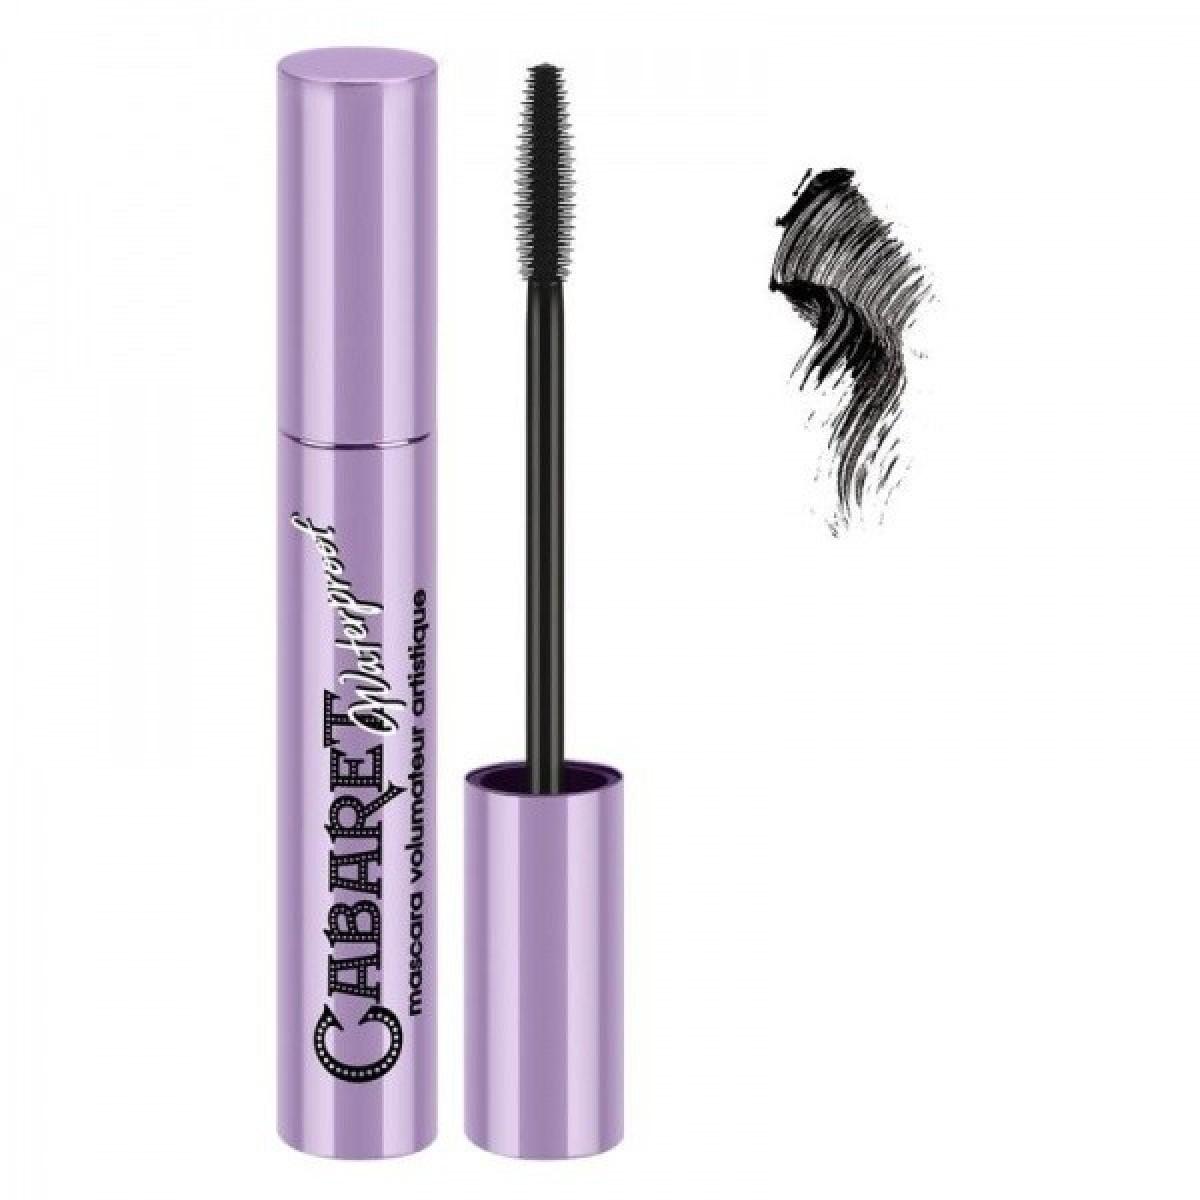 Cabaret Waterproof Mascara